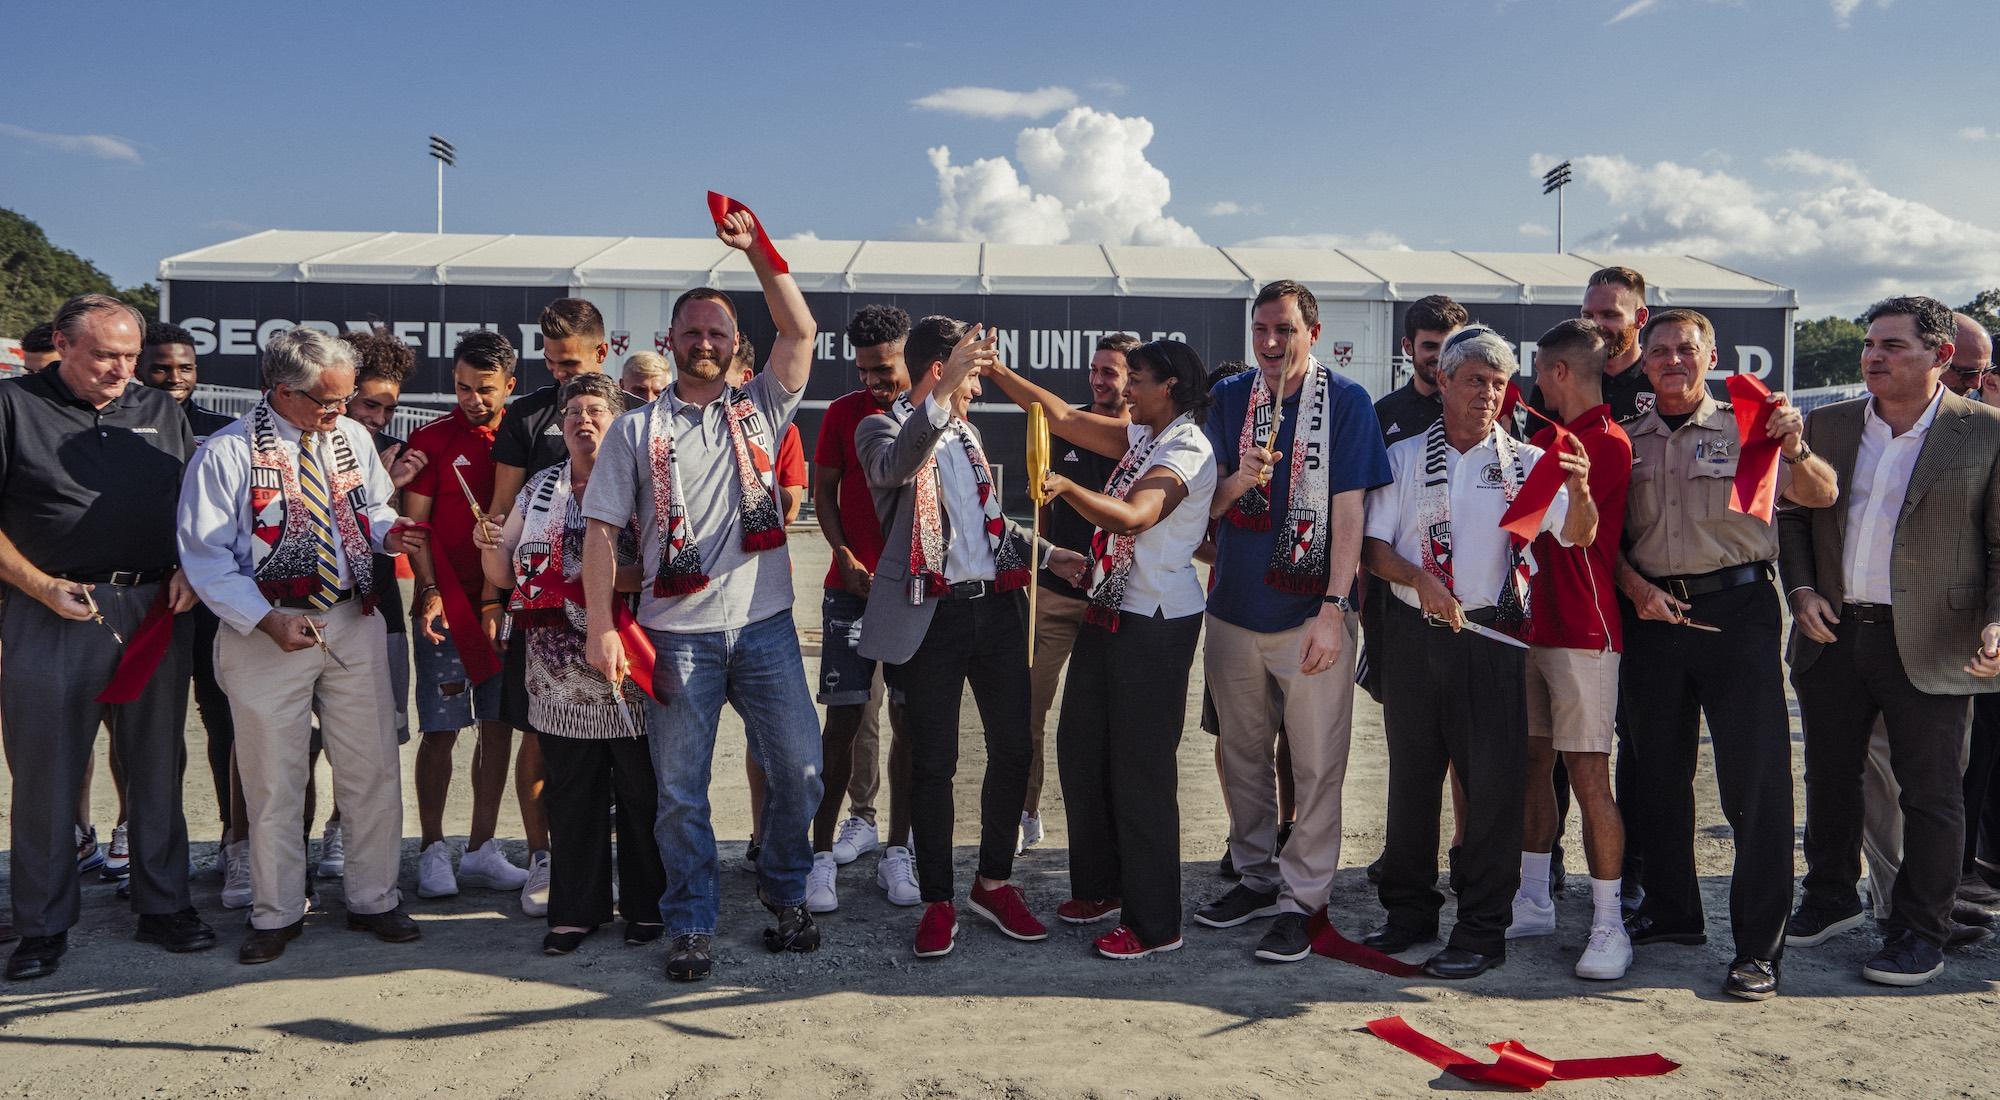 Loudoun United hold ribbon cutting ceremony at Segra Field